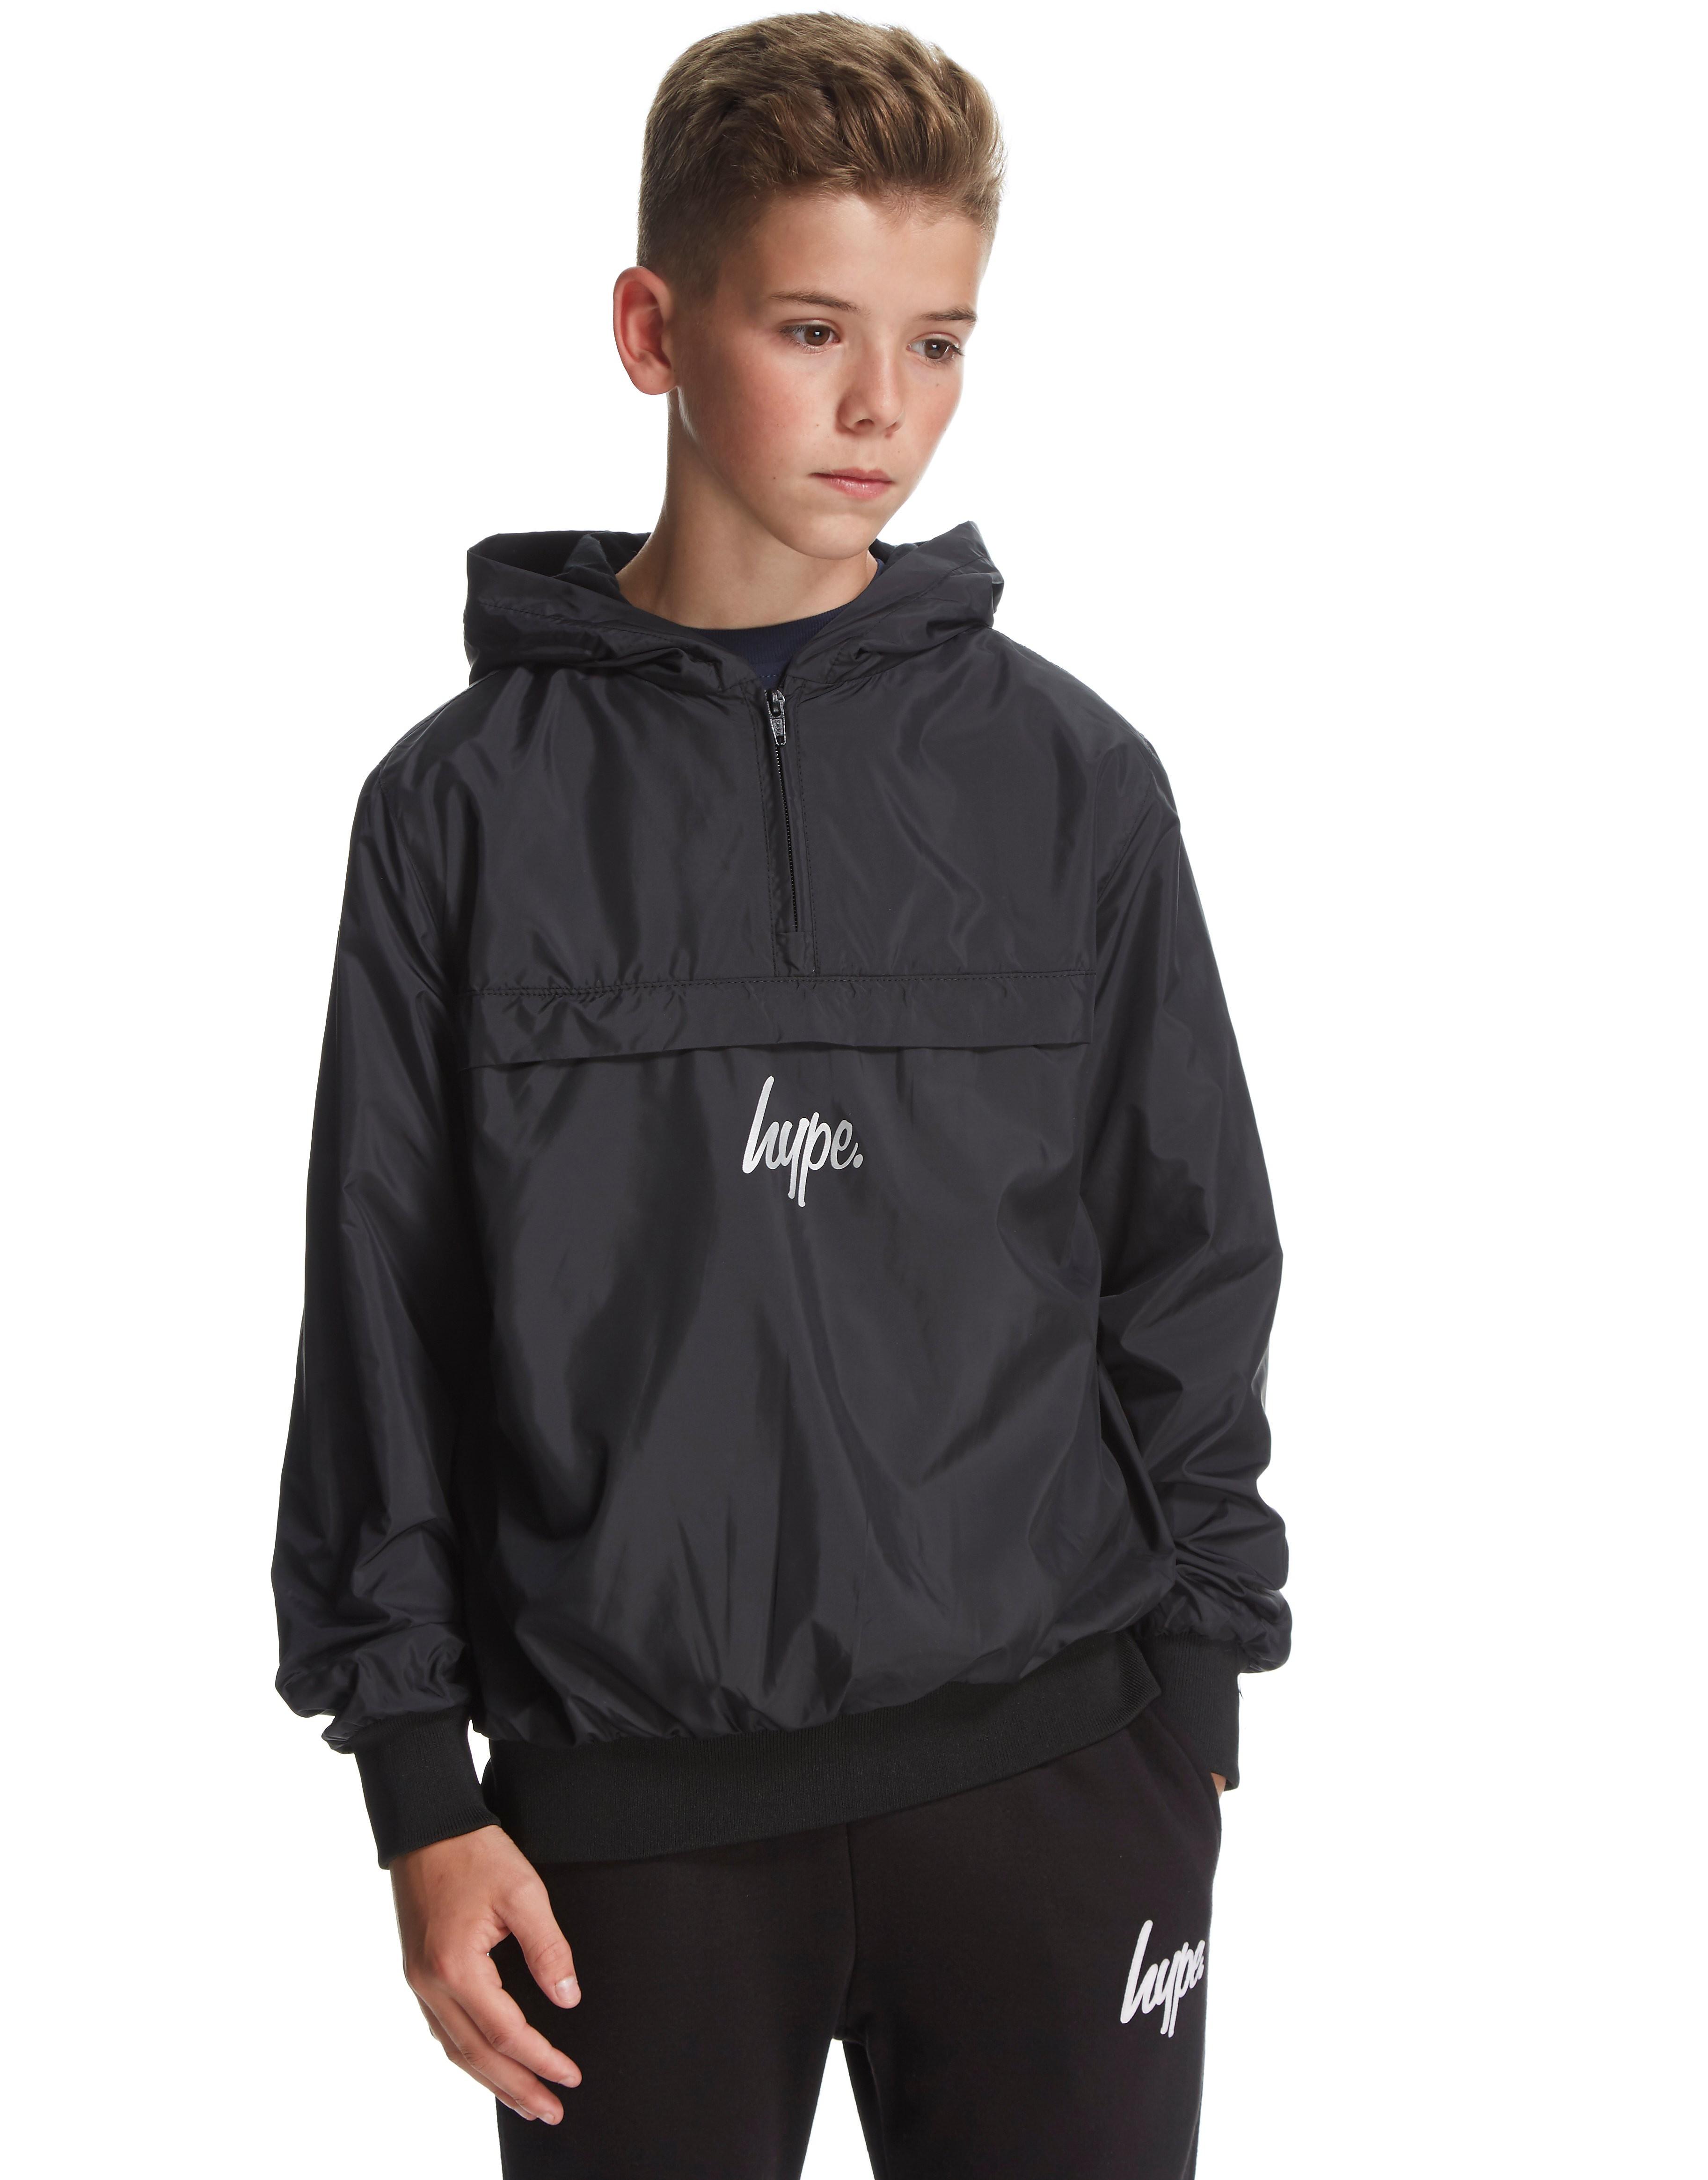 Hype Overhead Jacke für Kinder